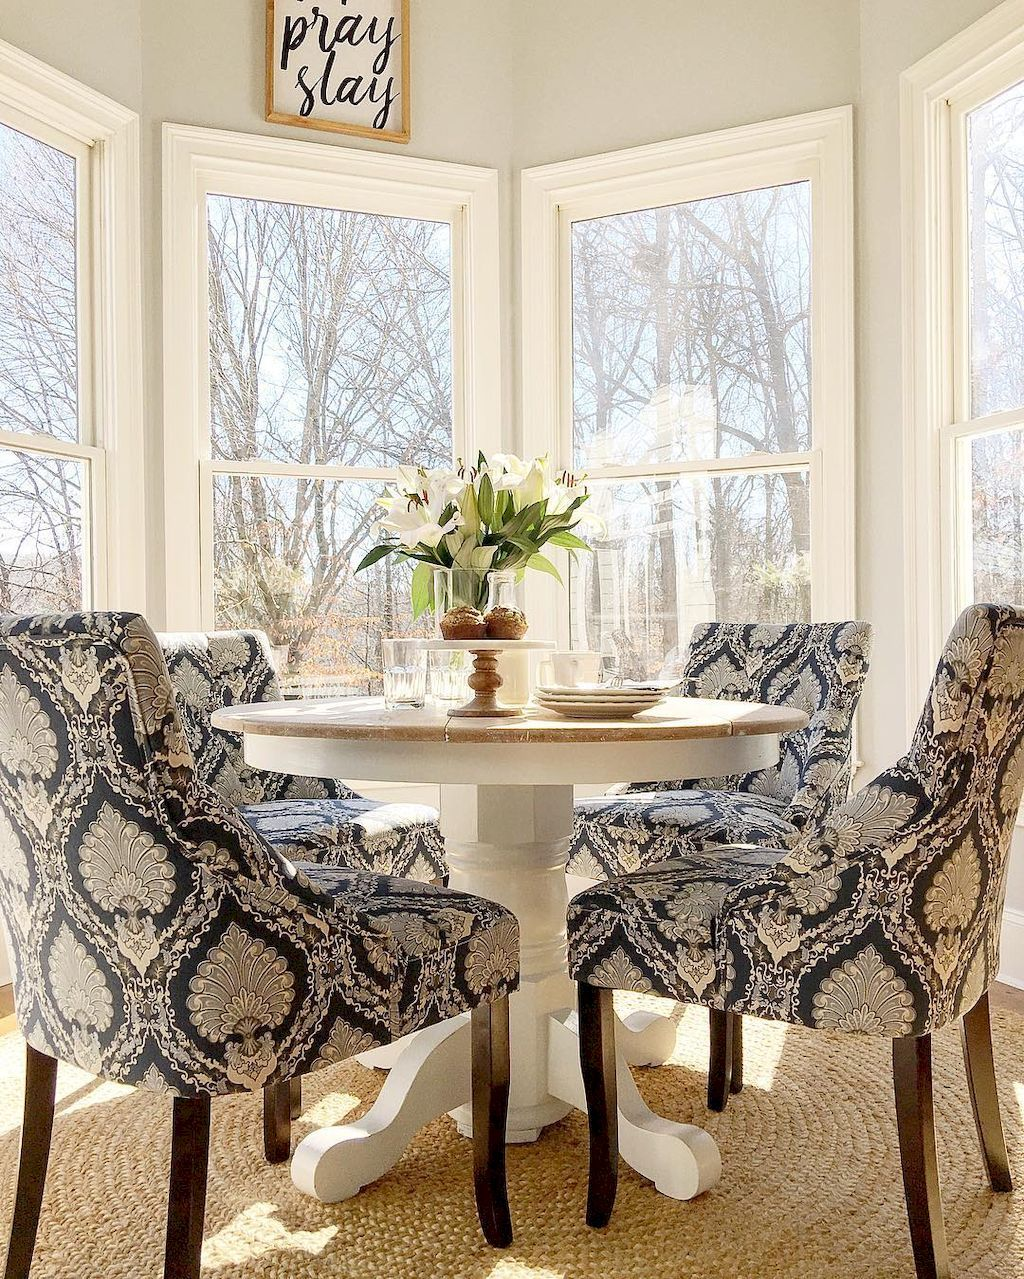 65 Clever Small Dining Room Ideas Homevialand Com Dining Room Small Small Dining Room Table Breakfast Nook Table